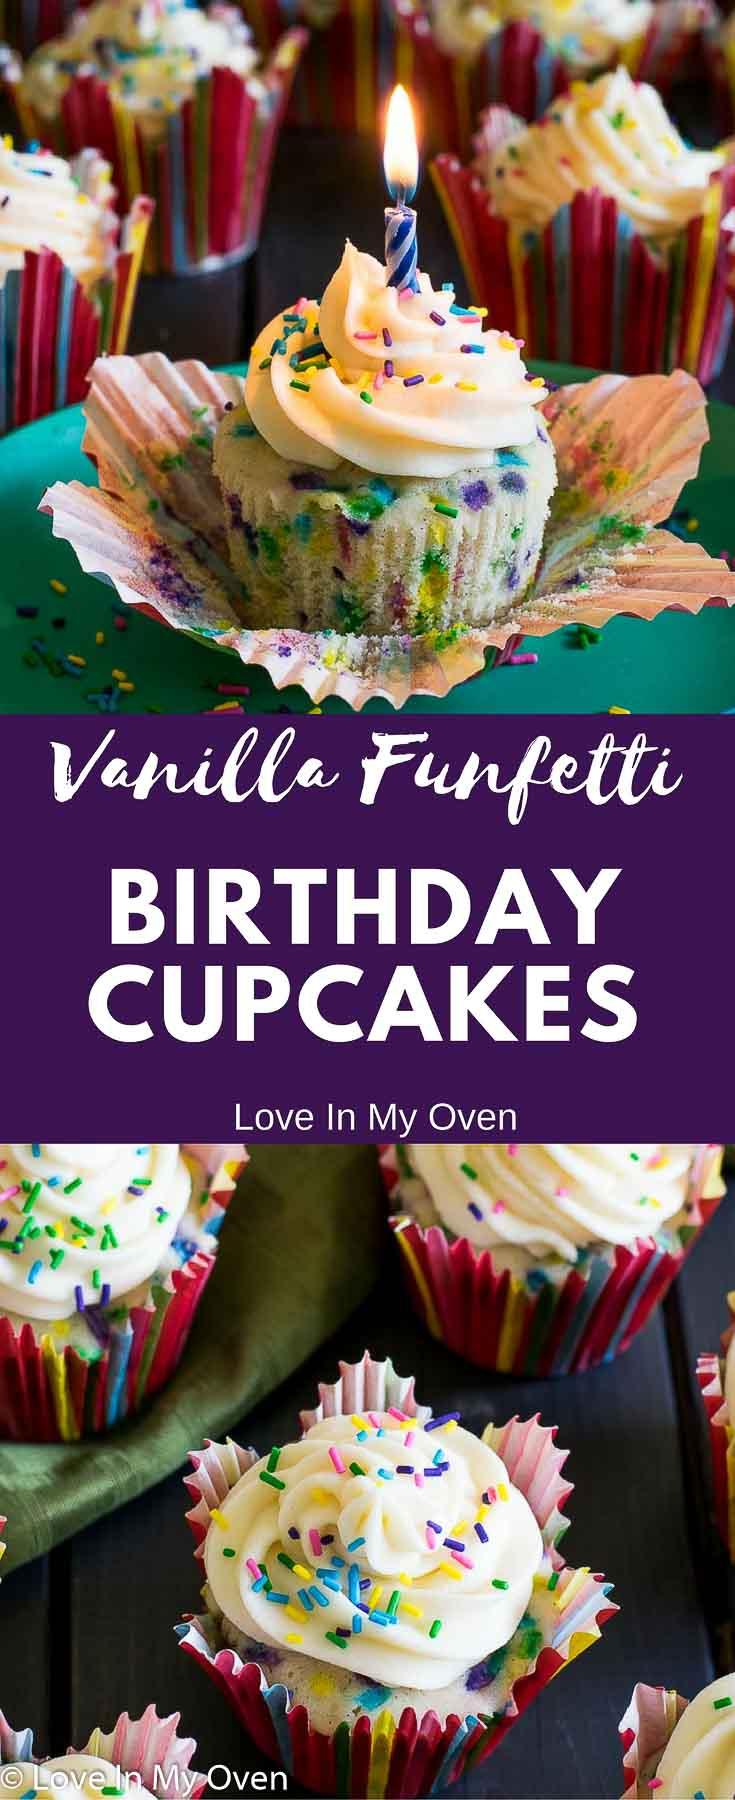 Vanilla Birthday Cupcakes